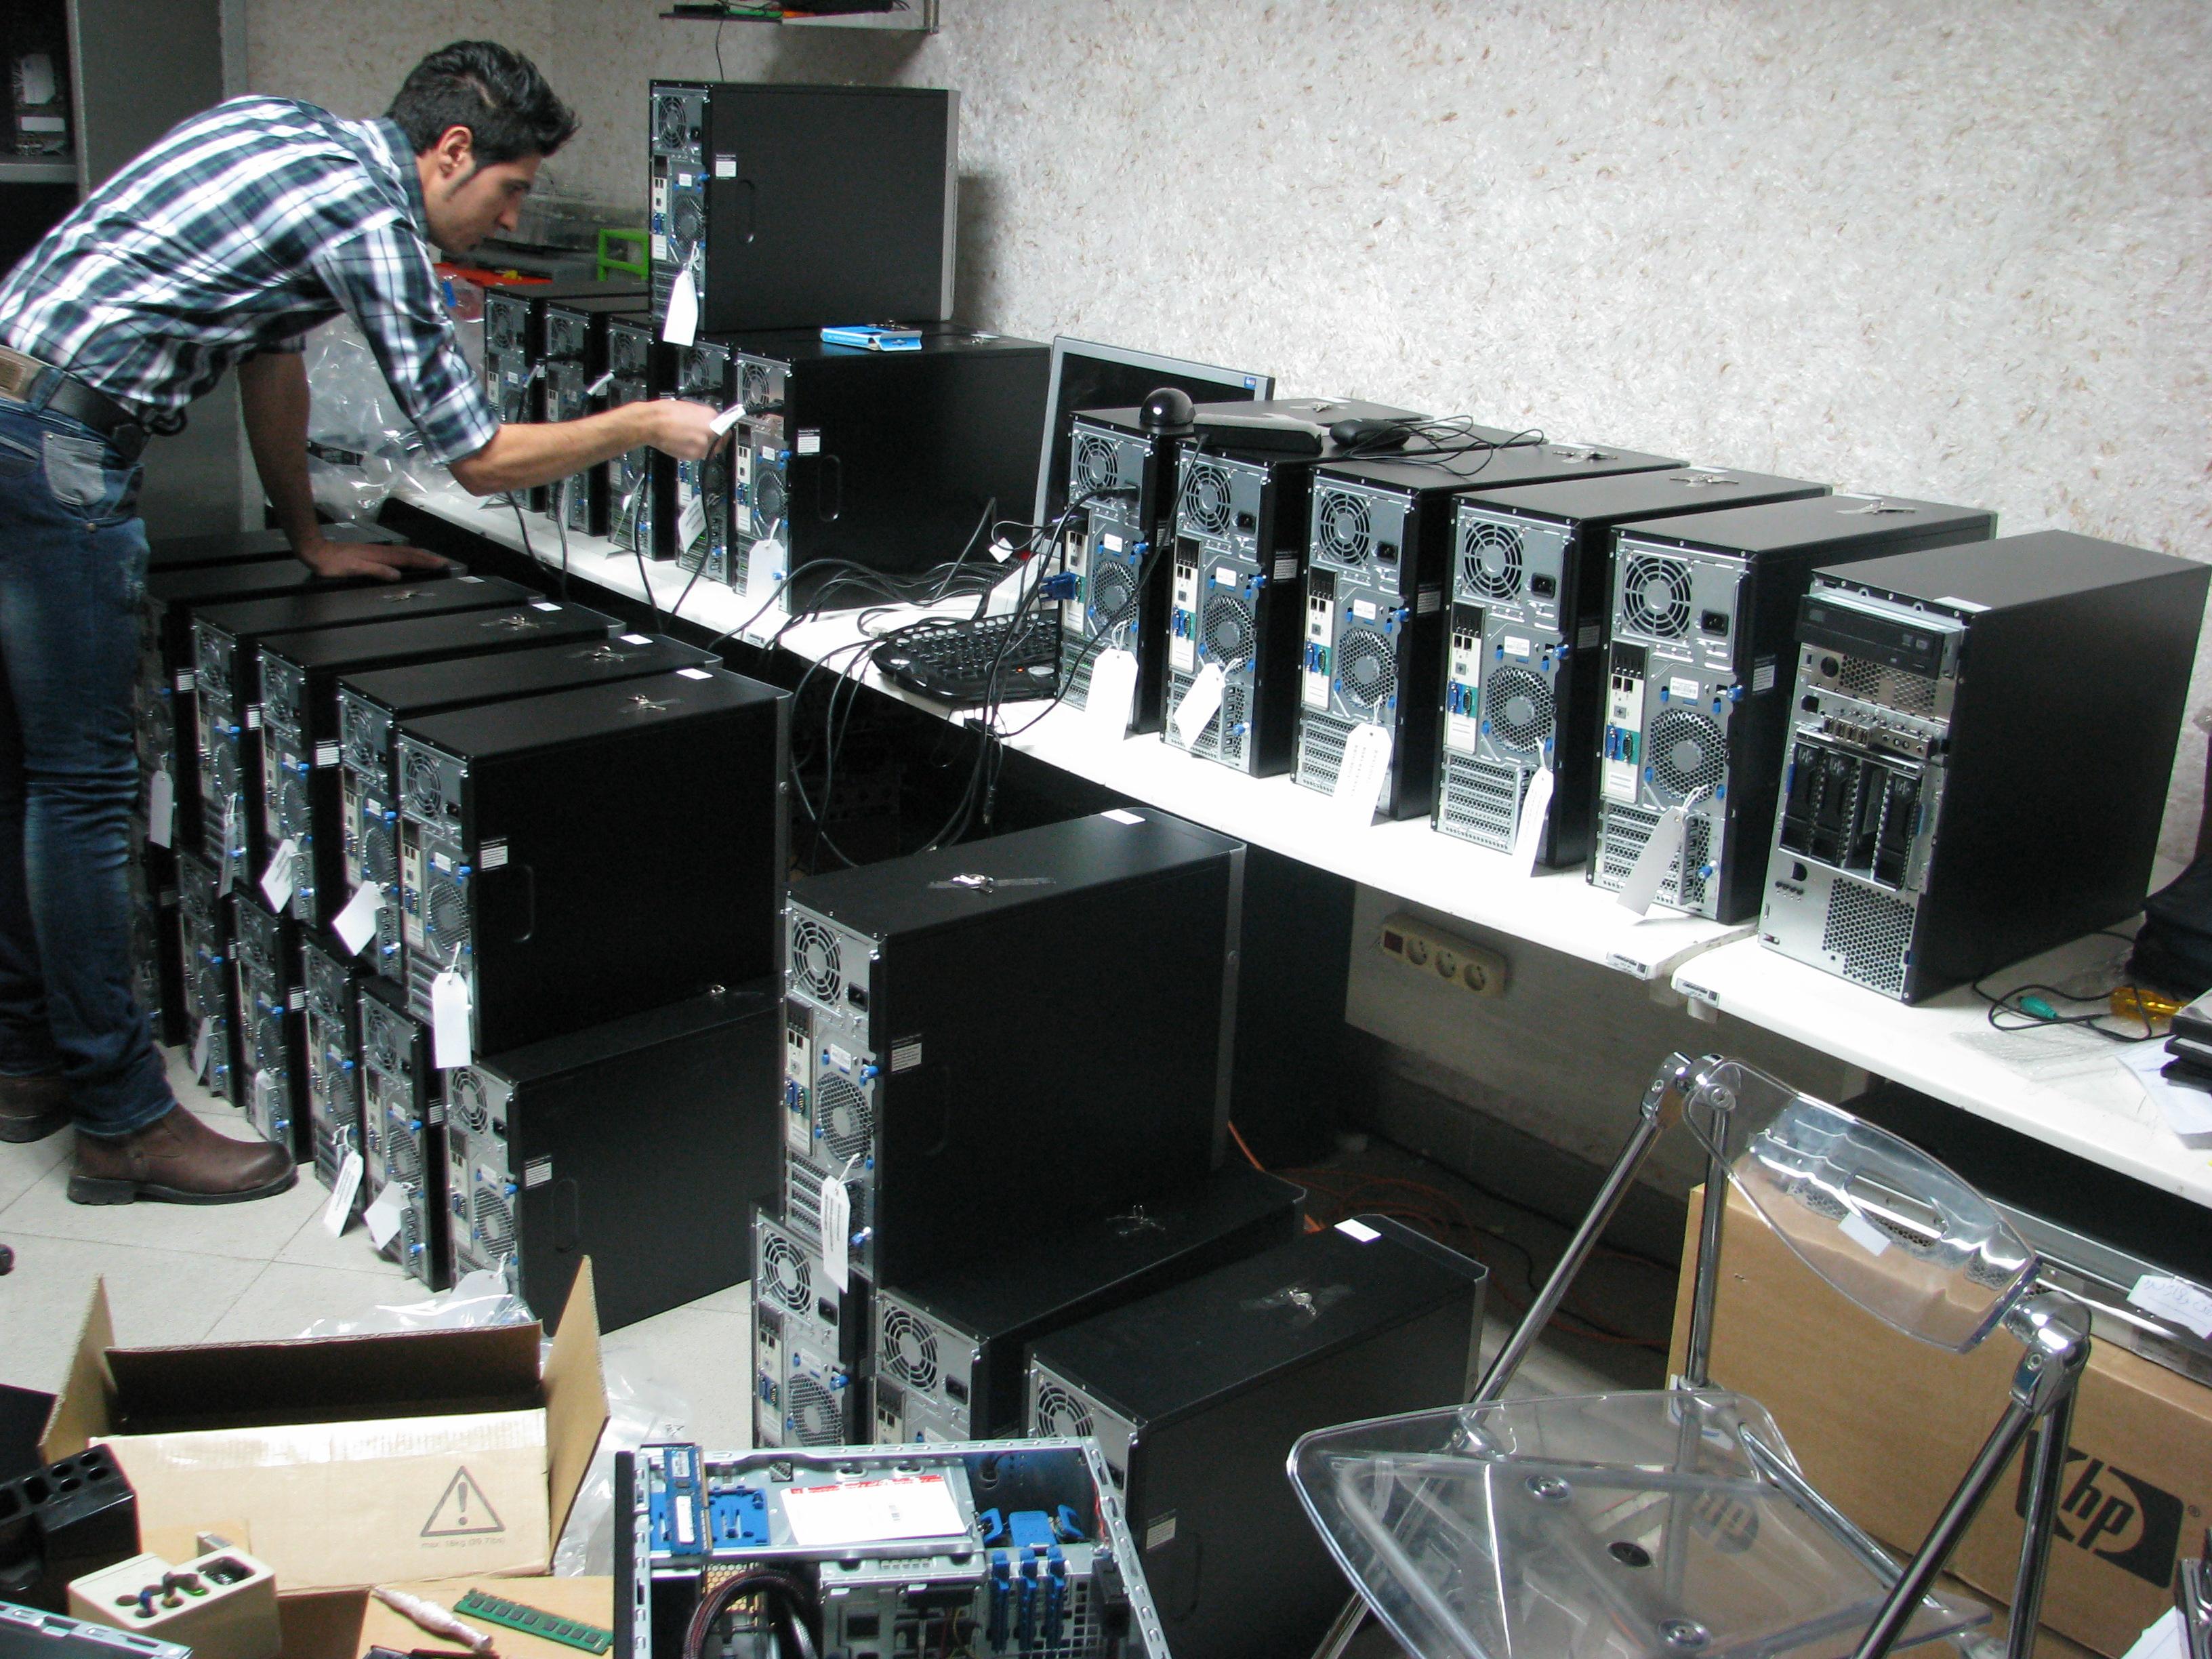 ML110 G9,قیمت سرور Hp Ml110 ,فروش سرور اچ پی, سرور hp , قیمت سرور اچ پی, سرور HP ProLiant ML110e G9, سرور HP